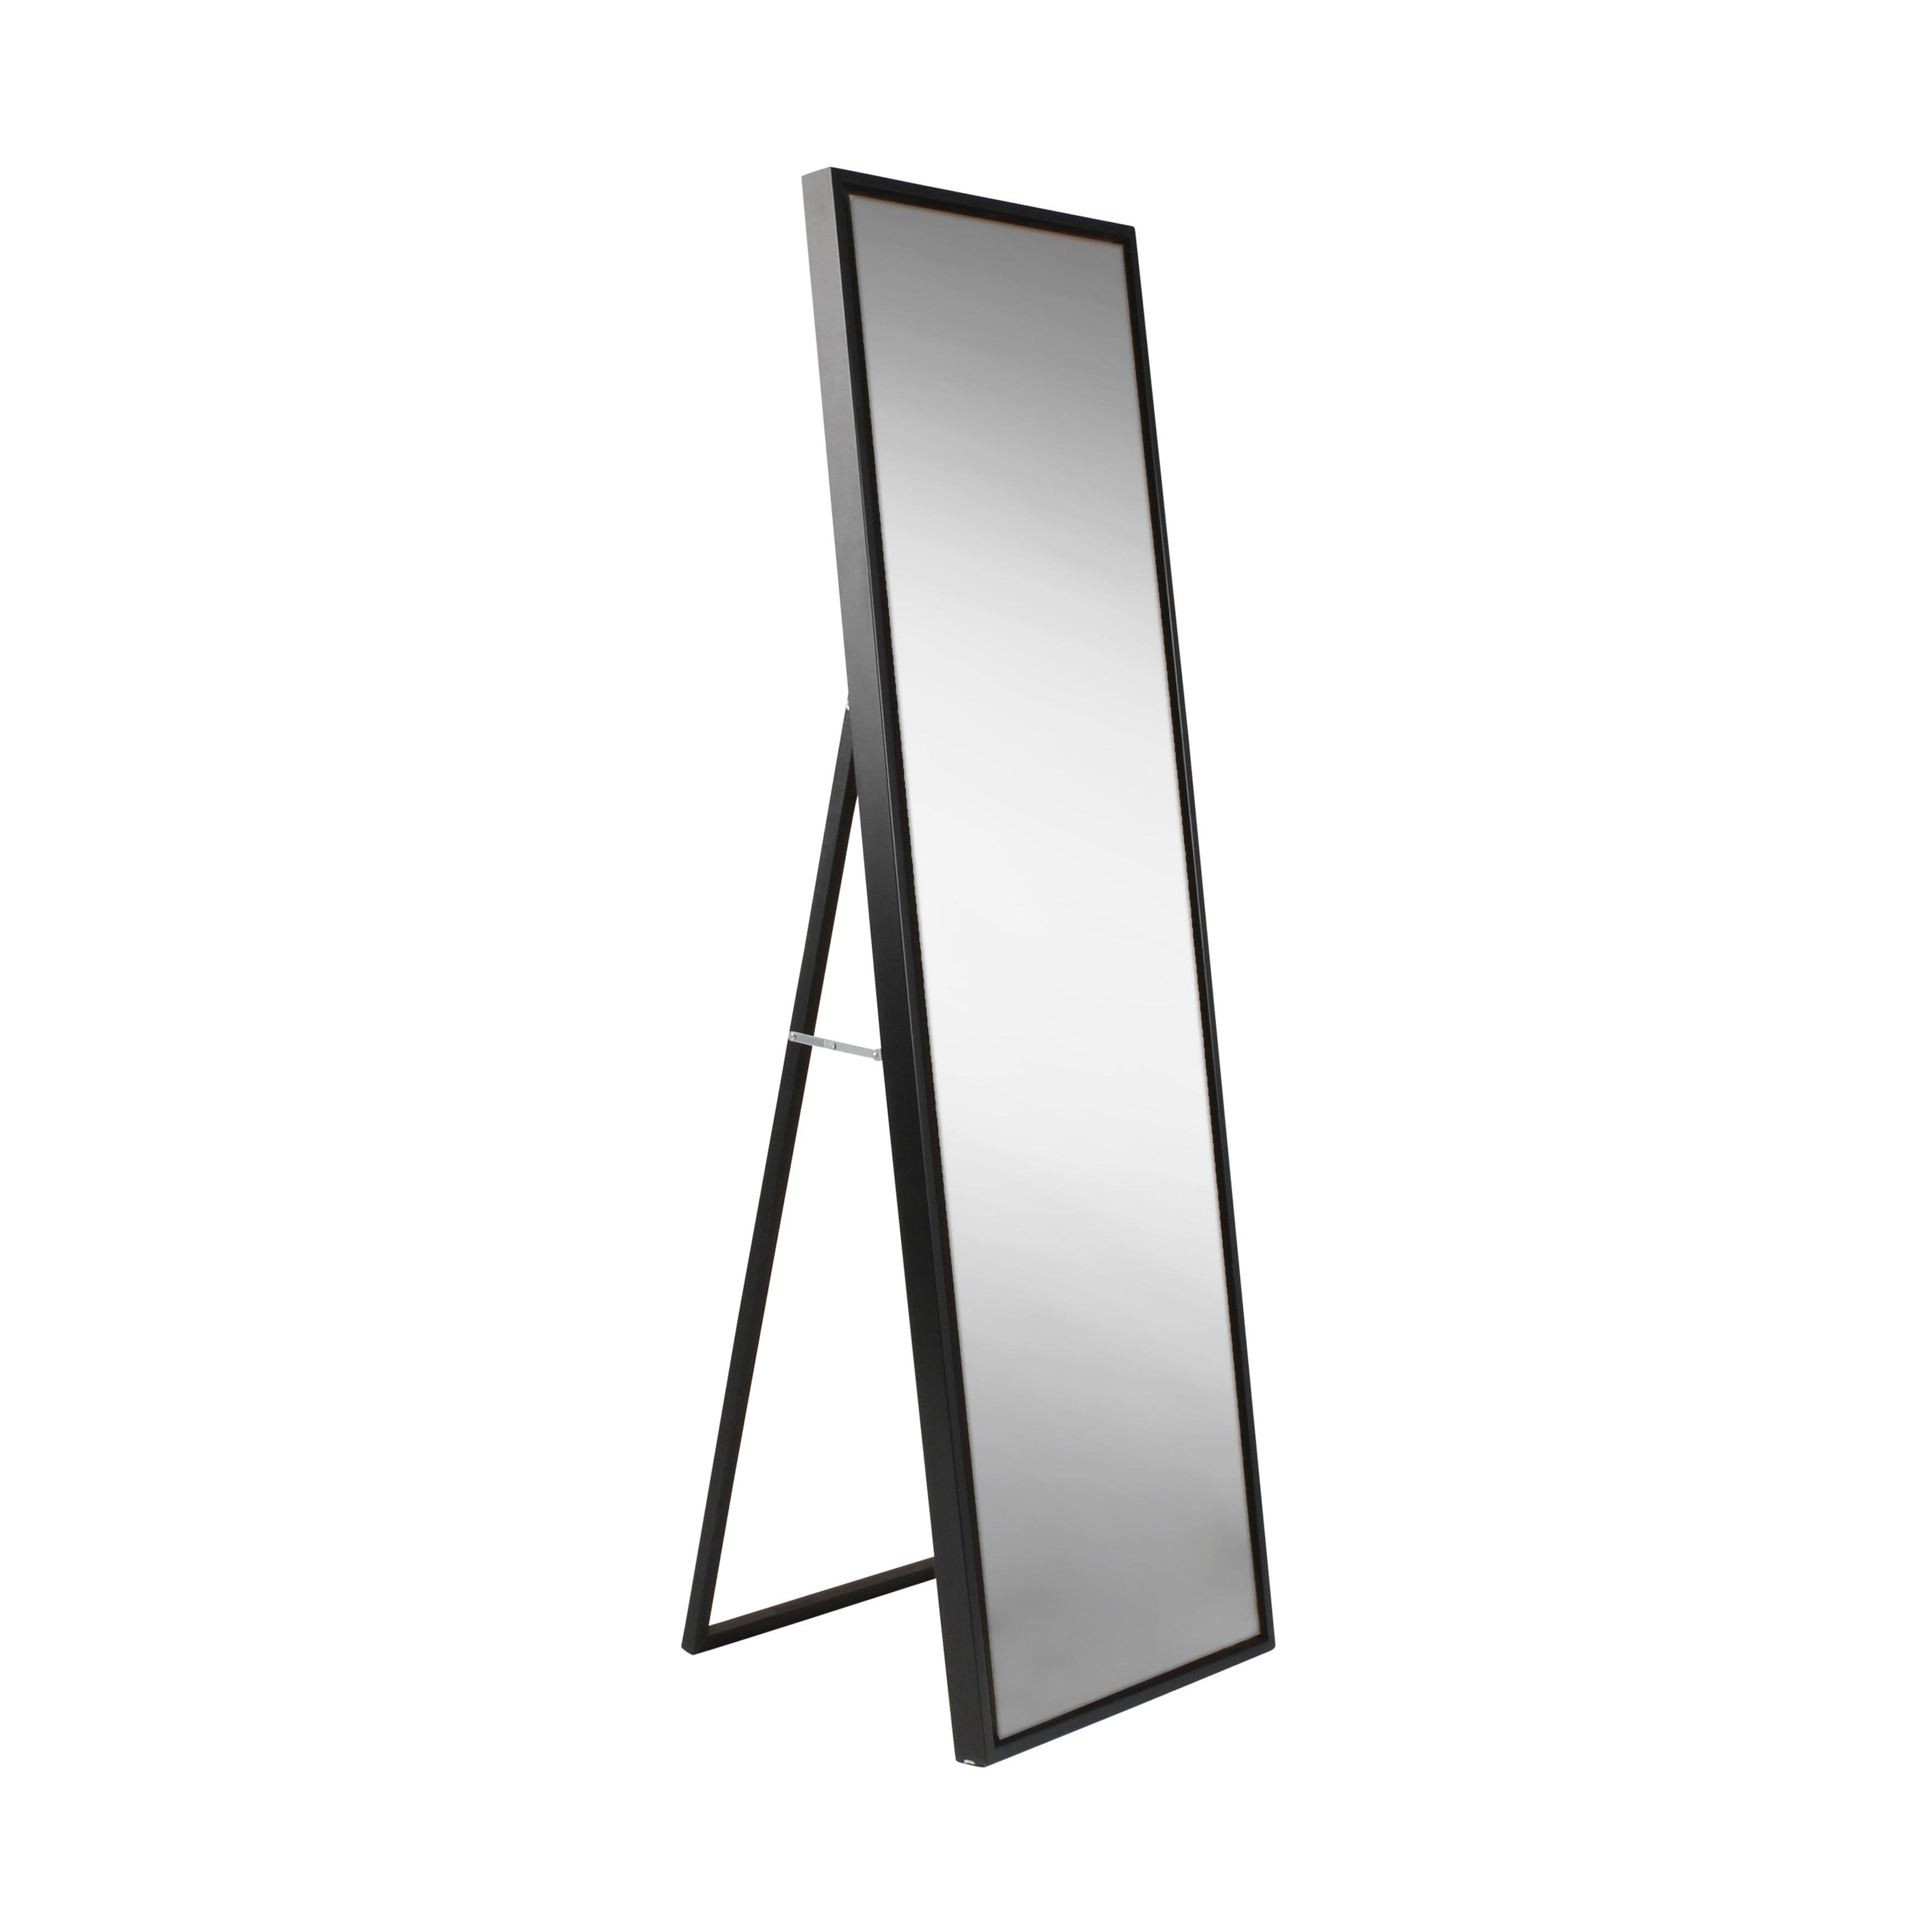 Carbon Loft Beckman Wood Framed Free Standing Mirror